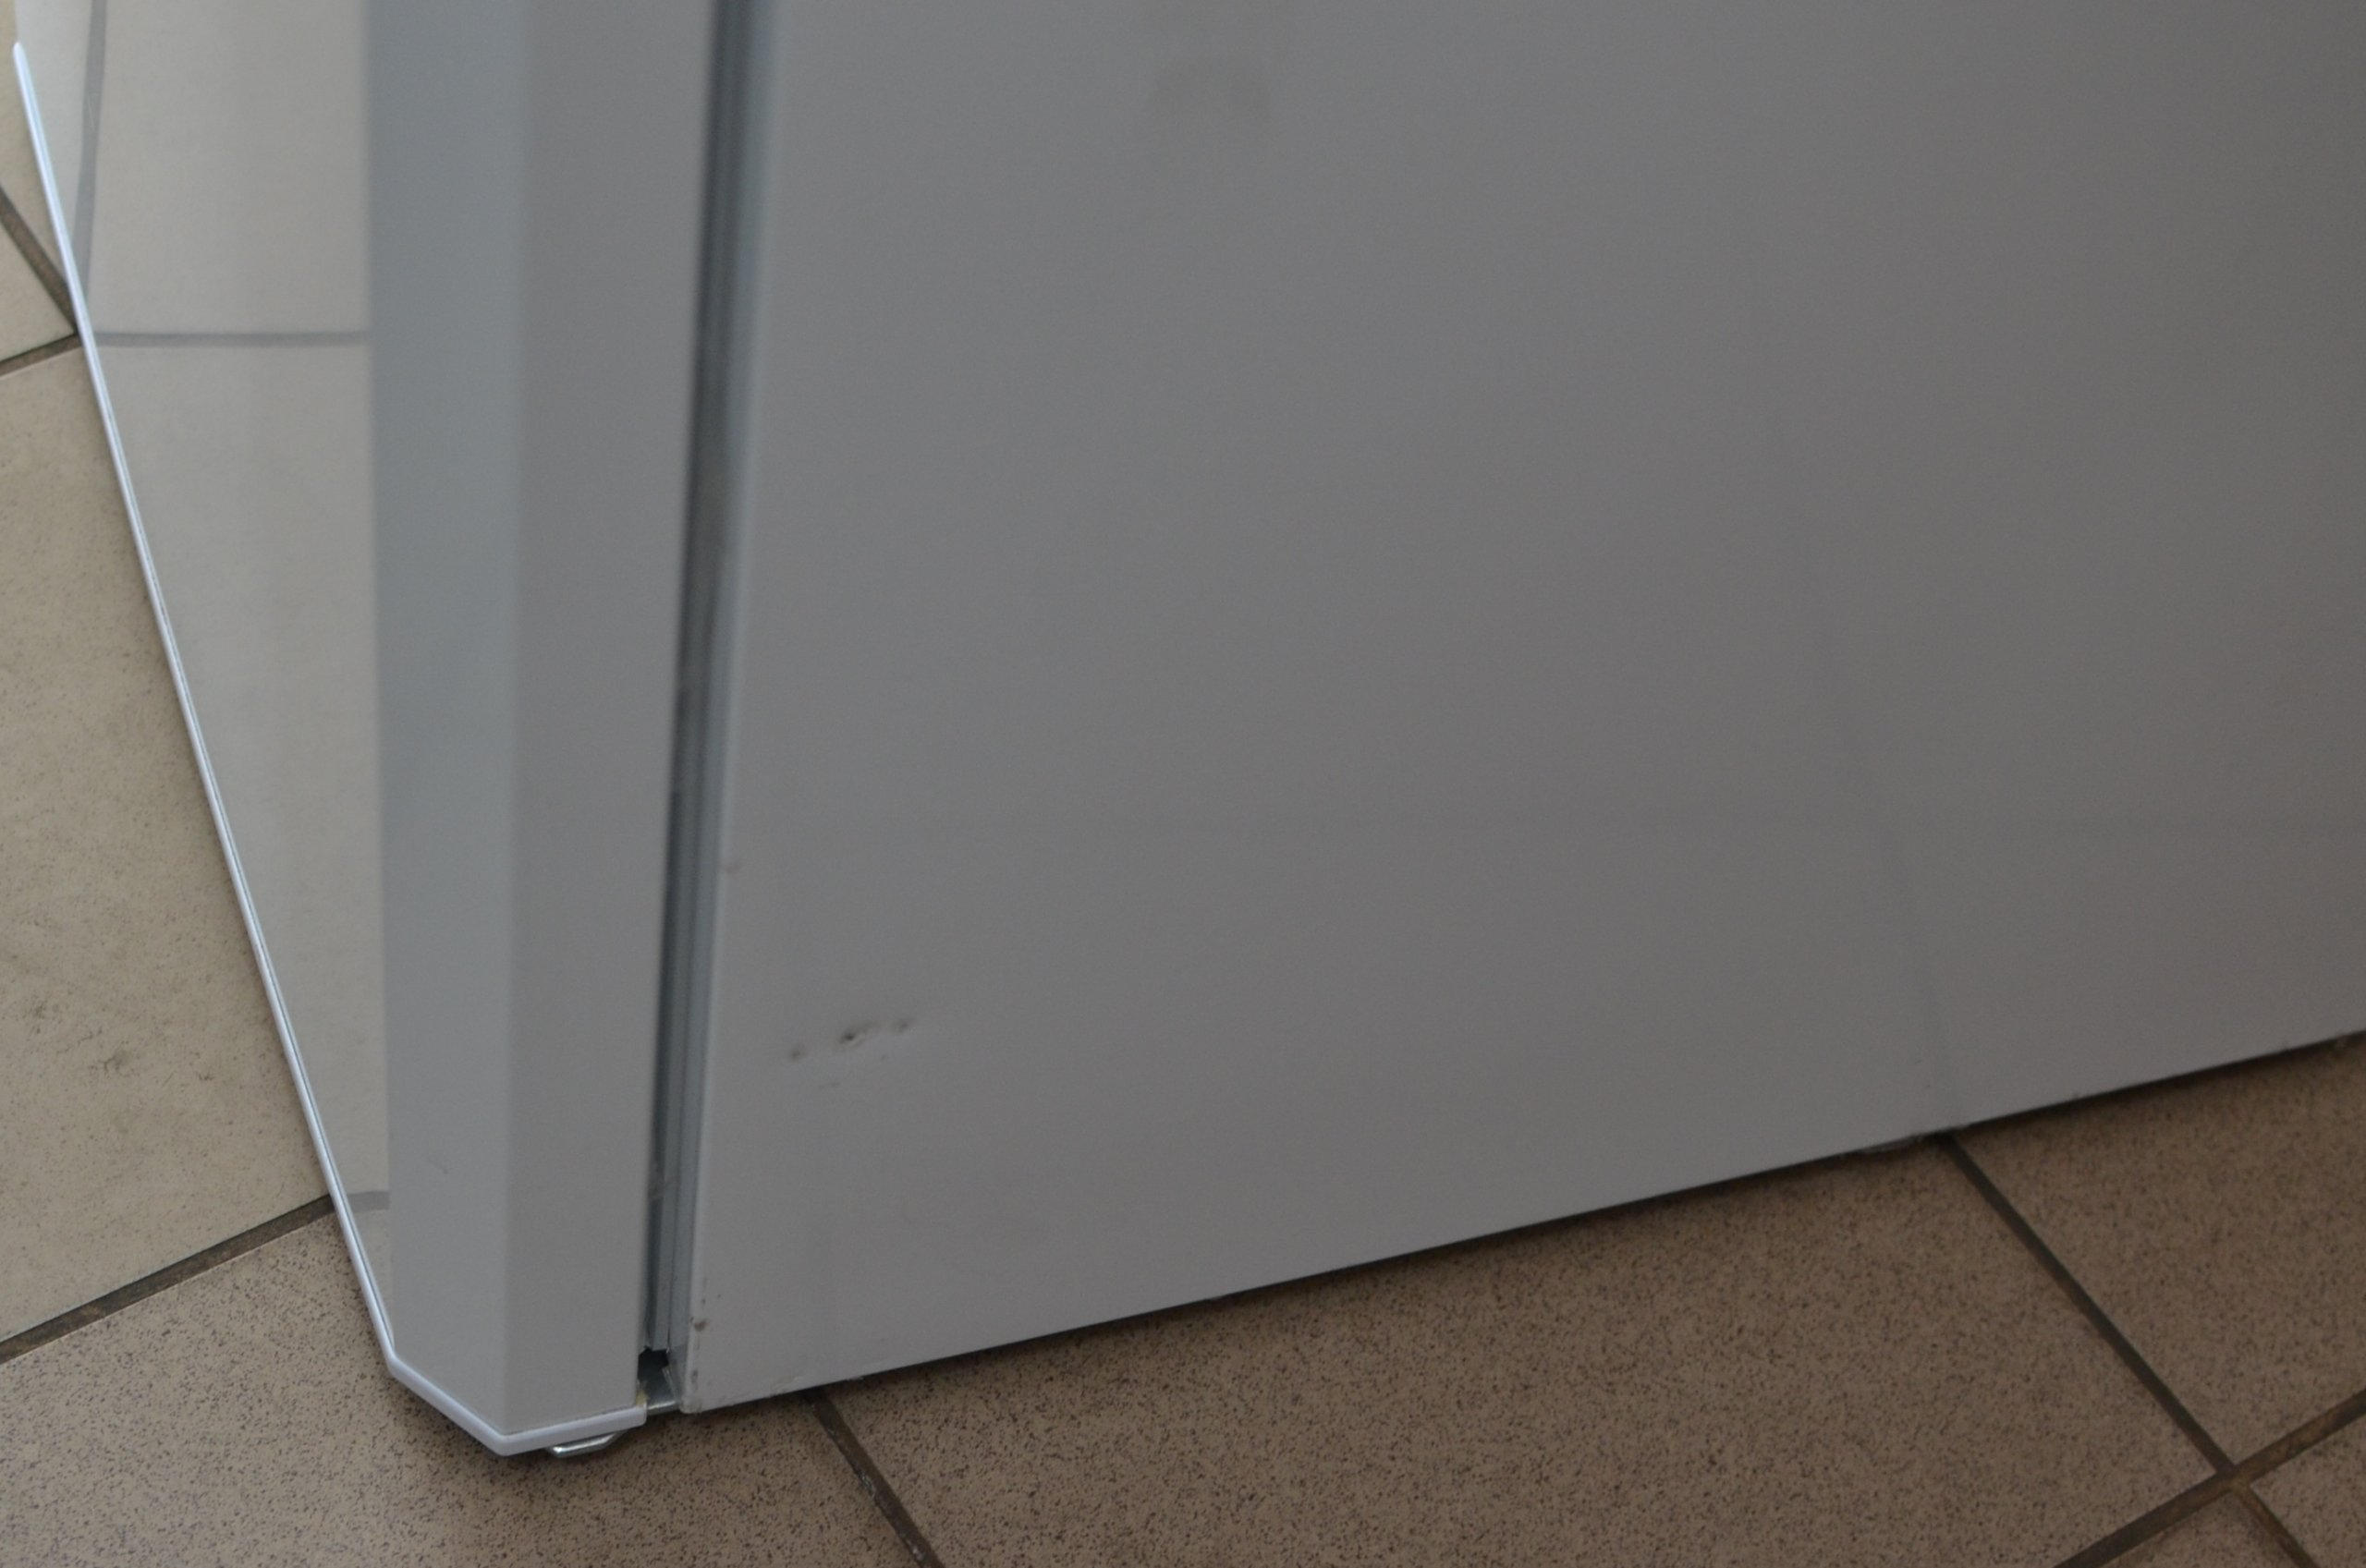 Amica Kühlschrank Ks 15123 W : Amica kühlschrank ks w amica kühlschrank mit gefrierfach